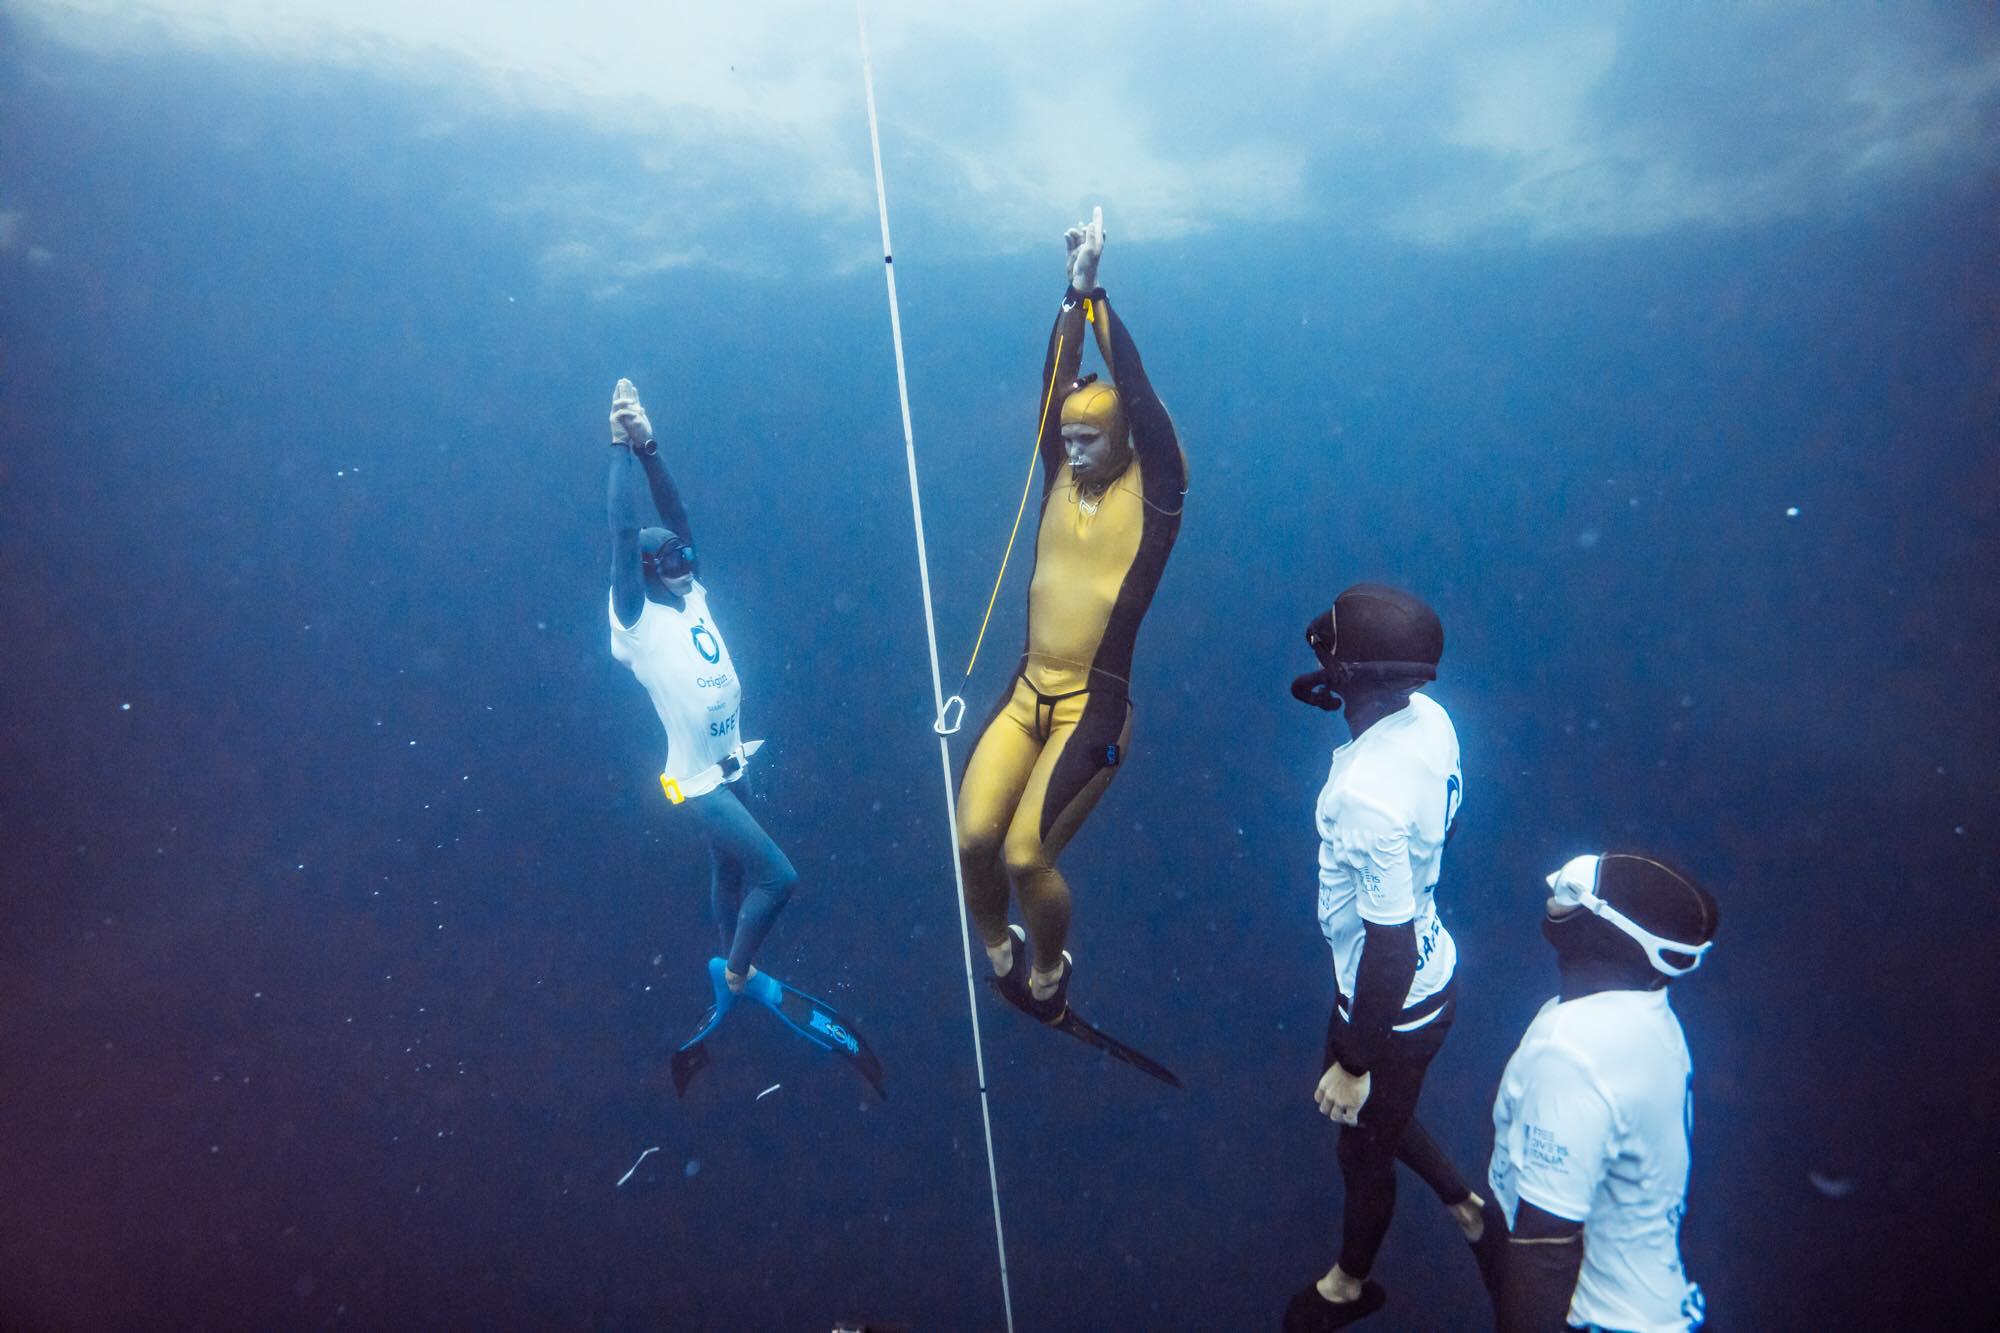 Alexey Molchanov 130m World Record at OriginECN Vertical Blue. Photo by Alex St-Jean